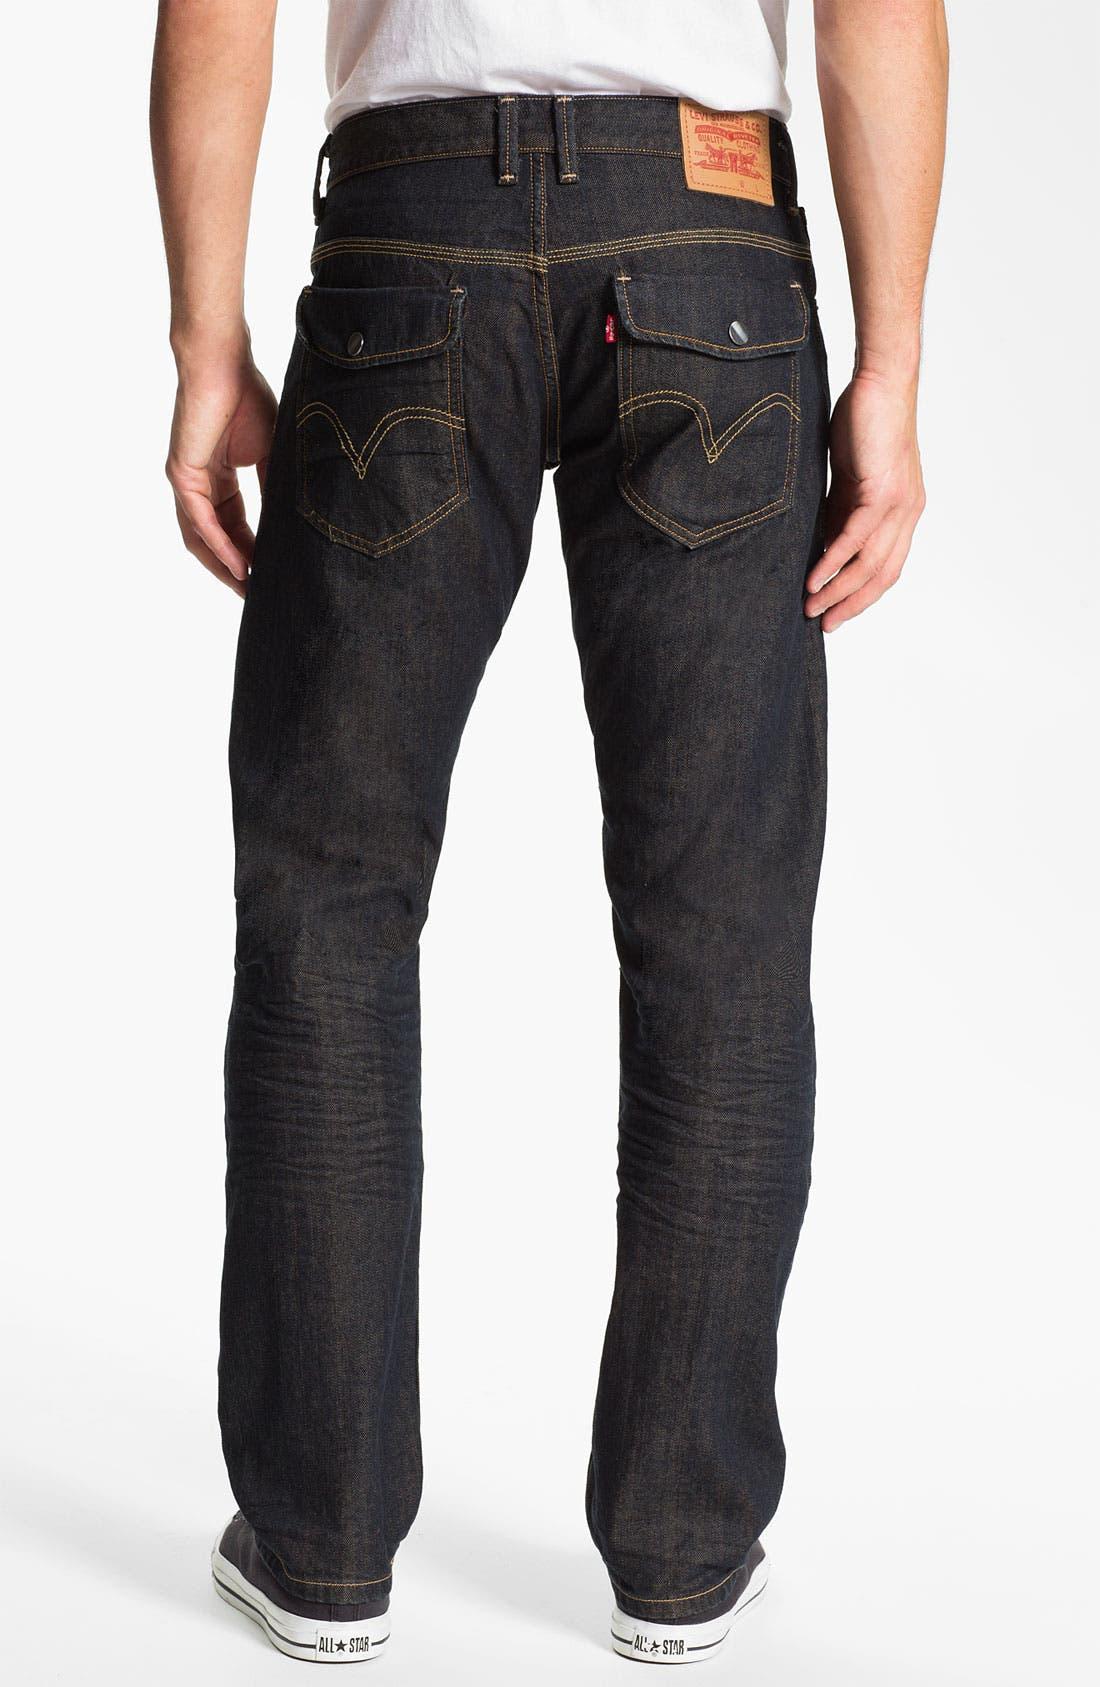 Alternate Image 1 Selected - Levi's® '514™' Slim Straight Leg Jeans (Speedbump)